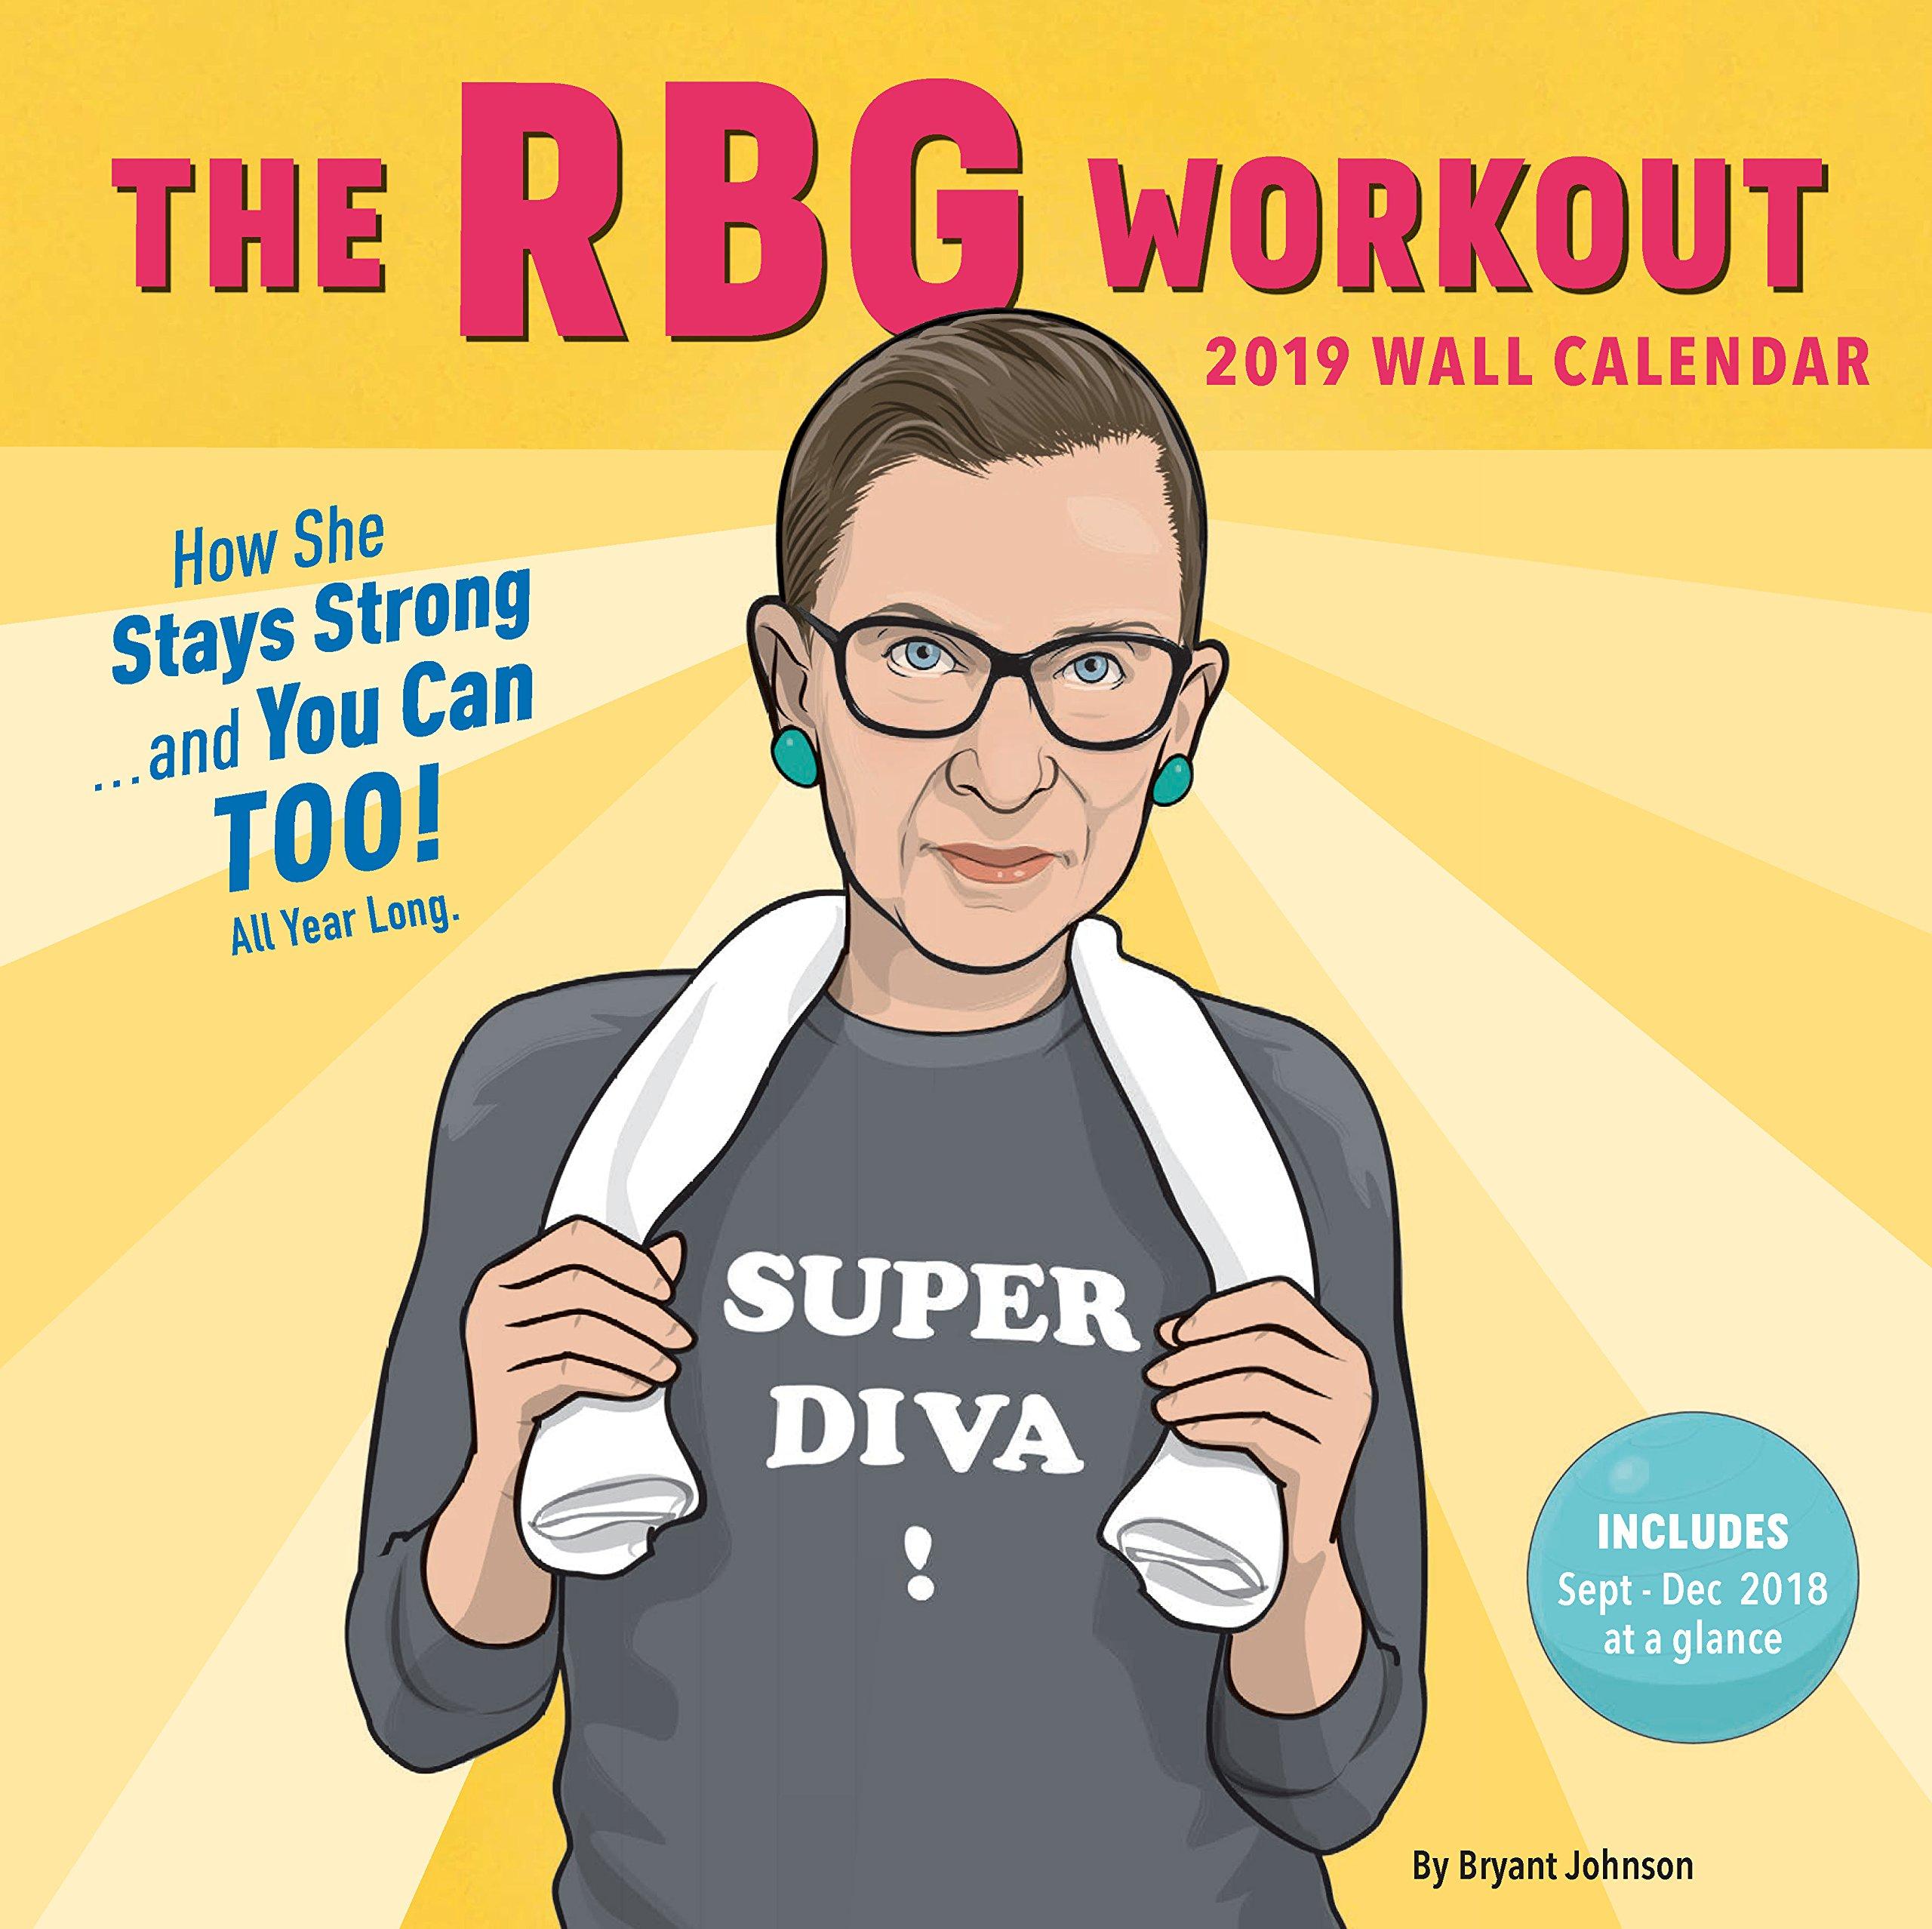 4de386db1dd02 The RBG Workout 2019 Wall Calendar  Bryant Johnson  9781452173597 ...